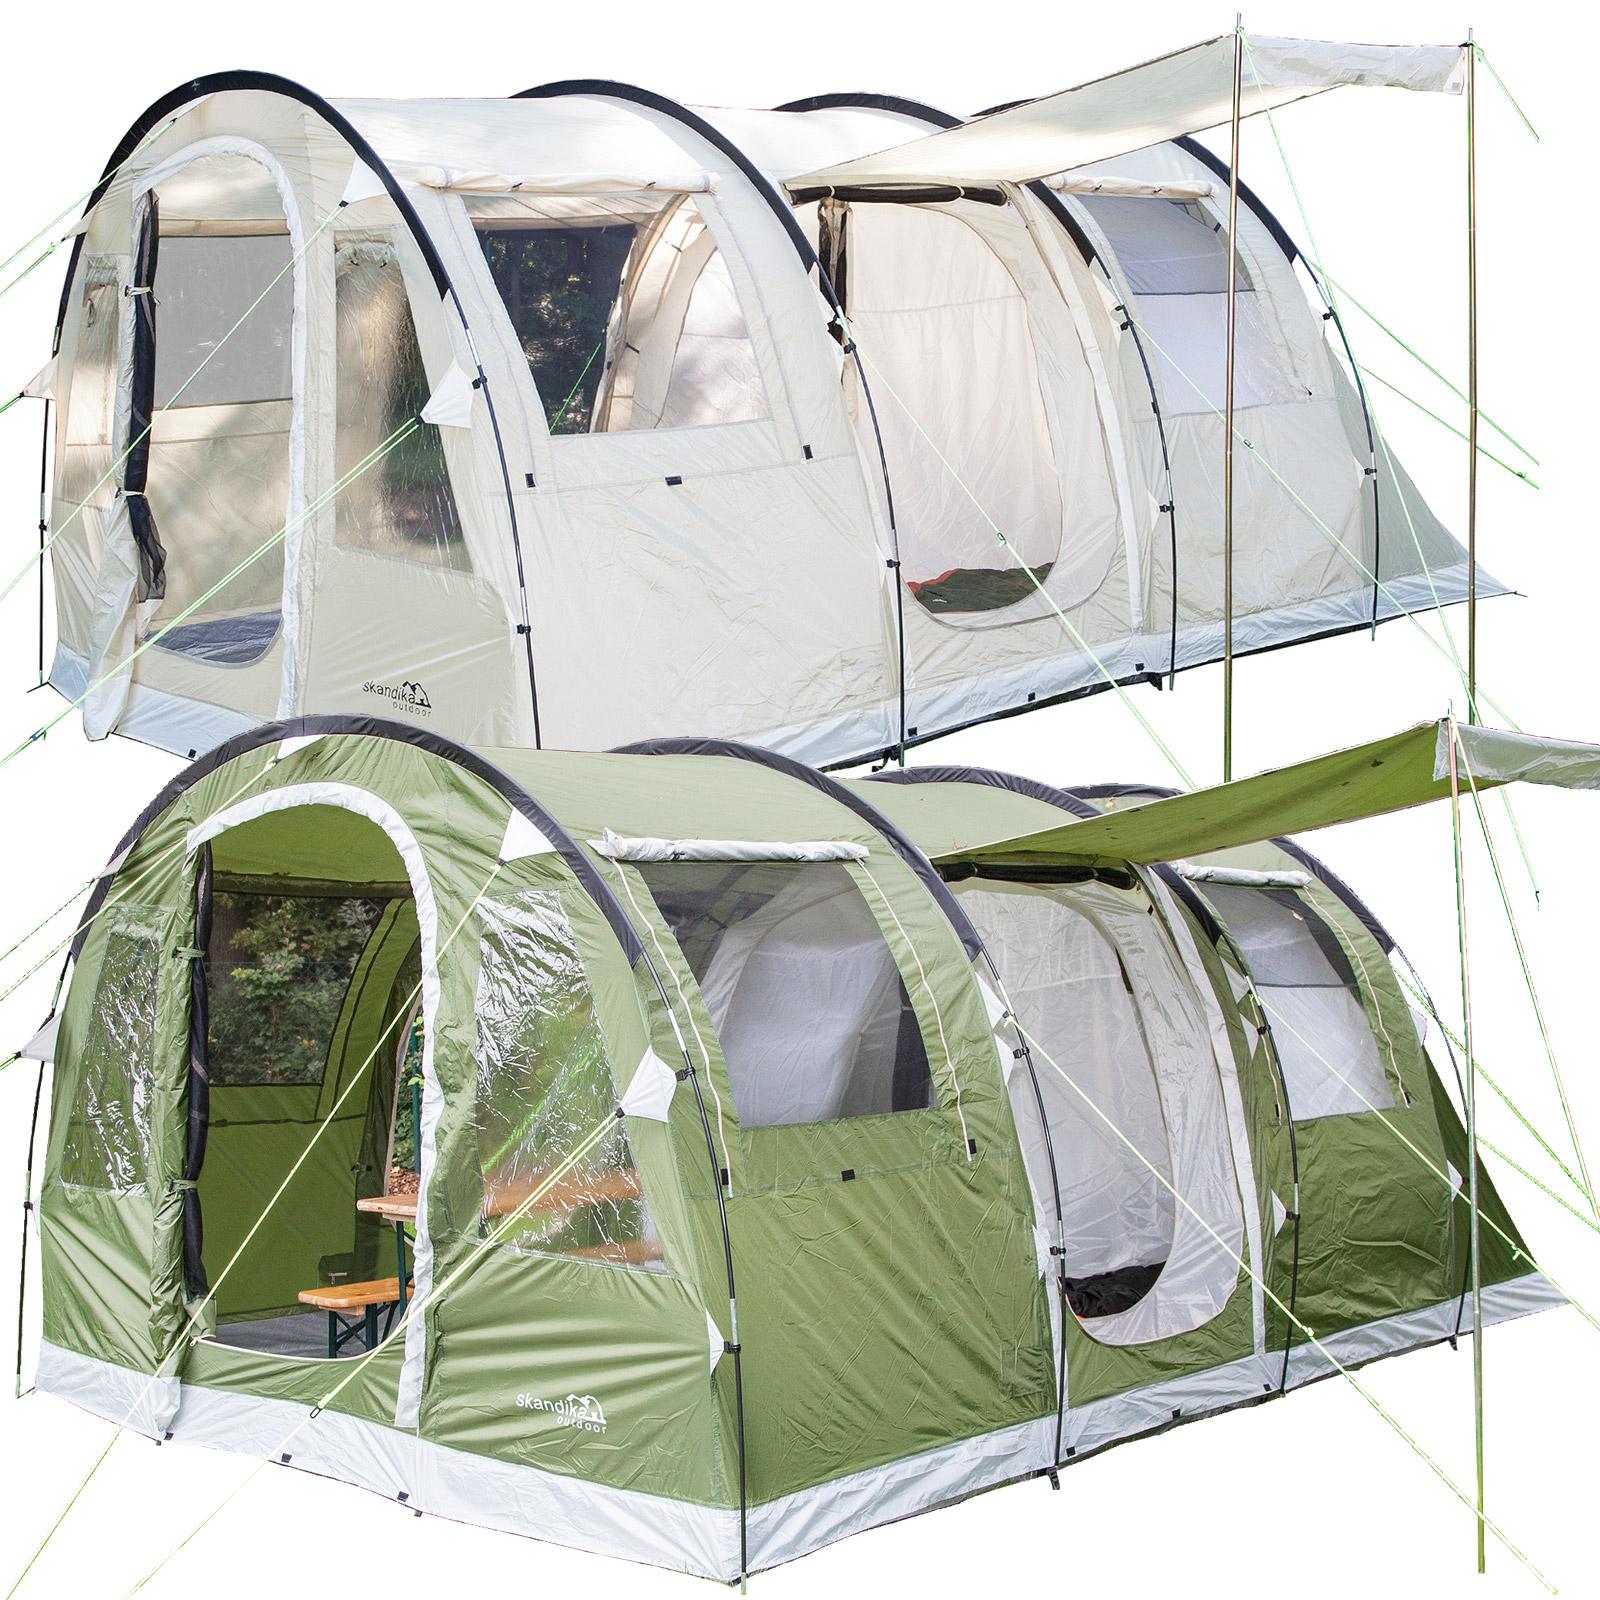 skandika-Gotland-Tunnel-Tents-4-6-Person-Canopy-  sc 1 st  eBay & skandika Gotland Tunnel Tents 4-6 Person Canopy Green u0026 Sand Sewn ...